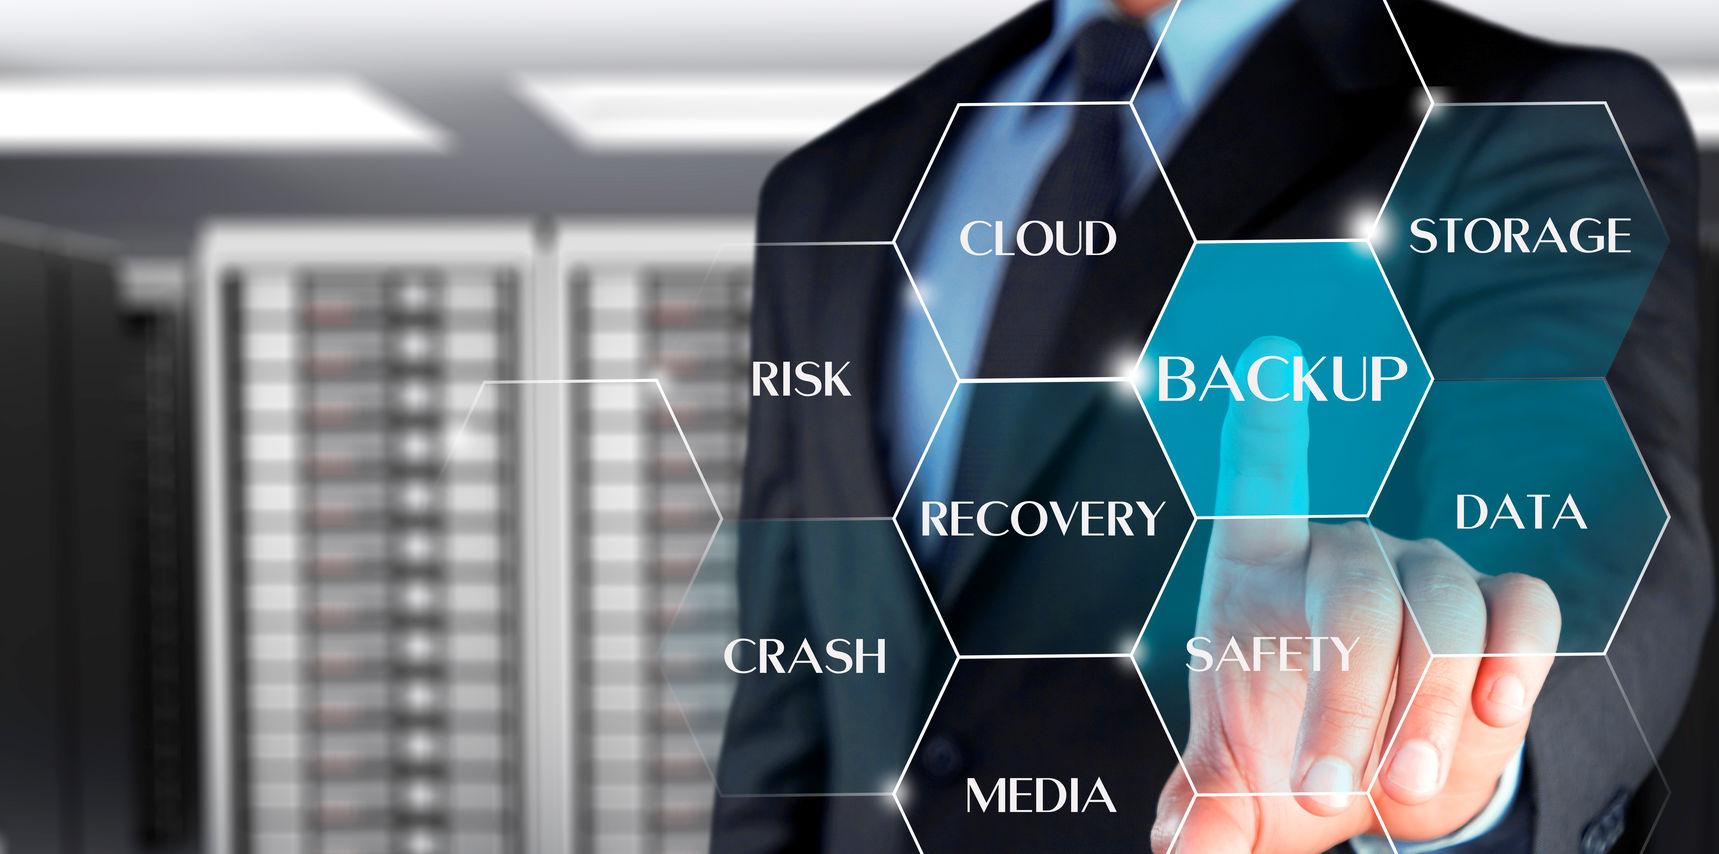 http://businesssecurityconsultants.com/wp-content/uploads/2016/08/iStock_95464485_MEDIUM-2-1.jpg